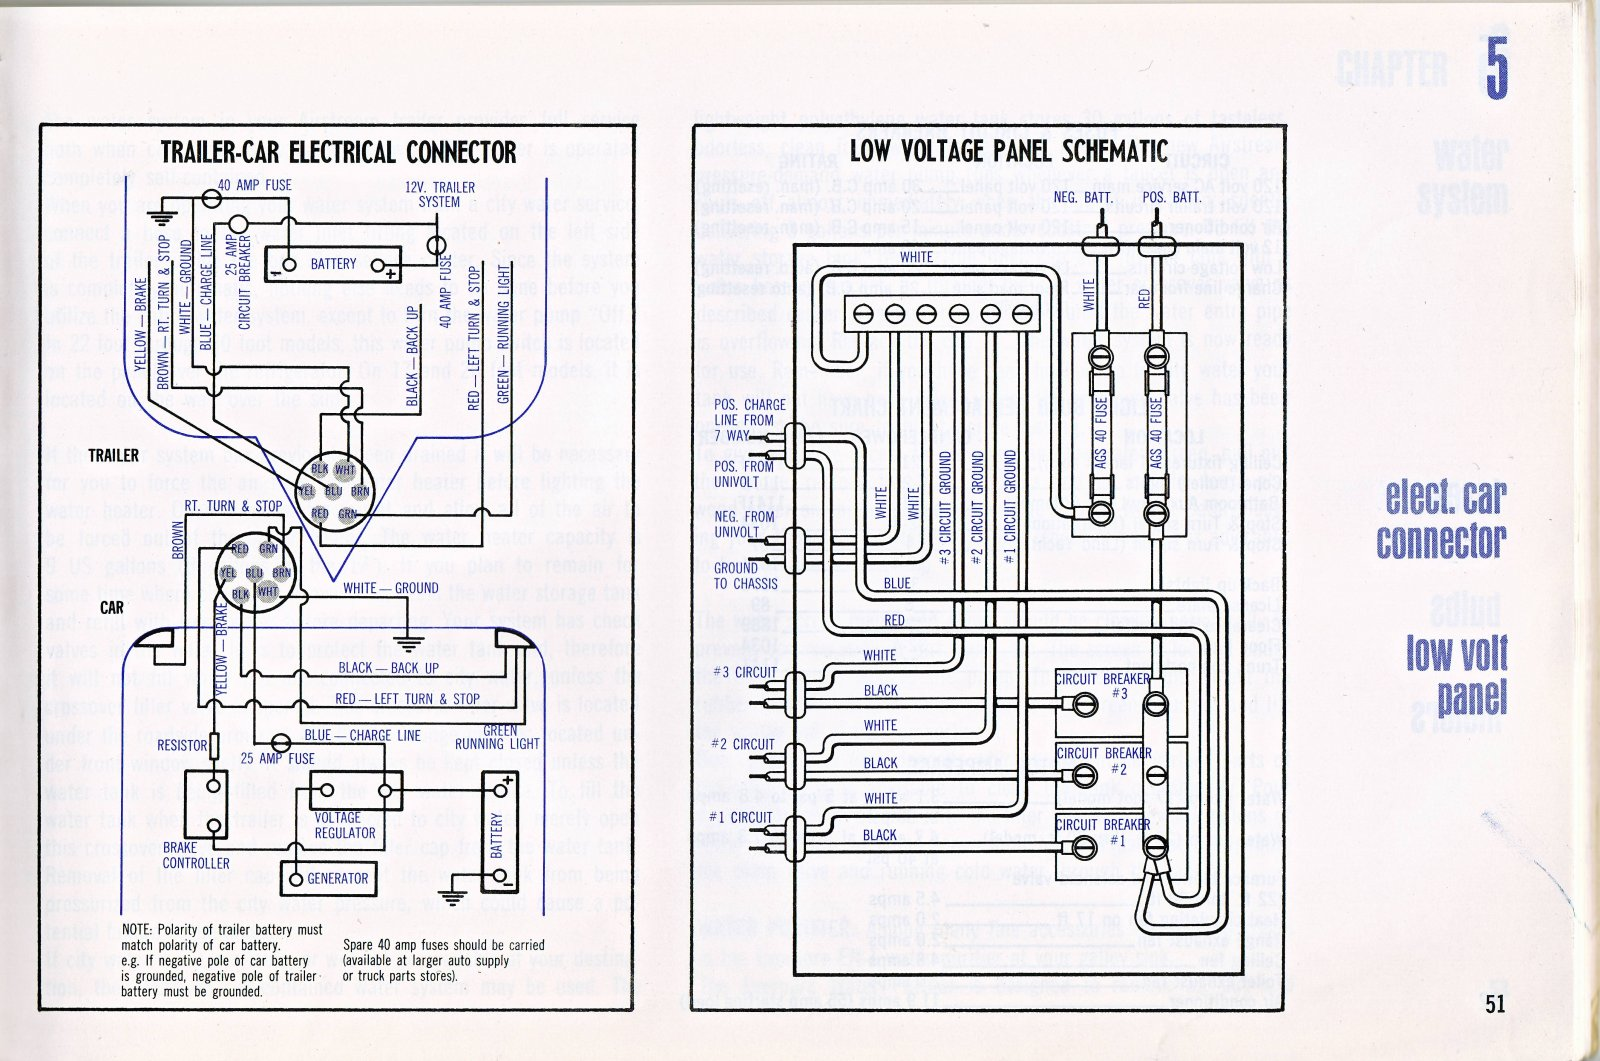 fleetwood prowler travel trailer wiring diagram wiring diagrams trailer battery wiring diagram diagrams